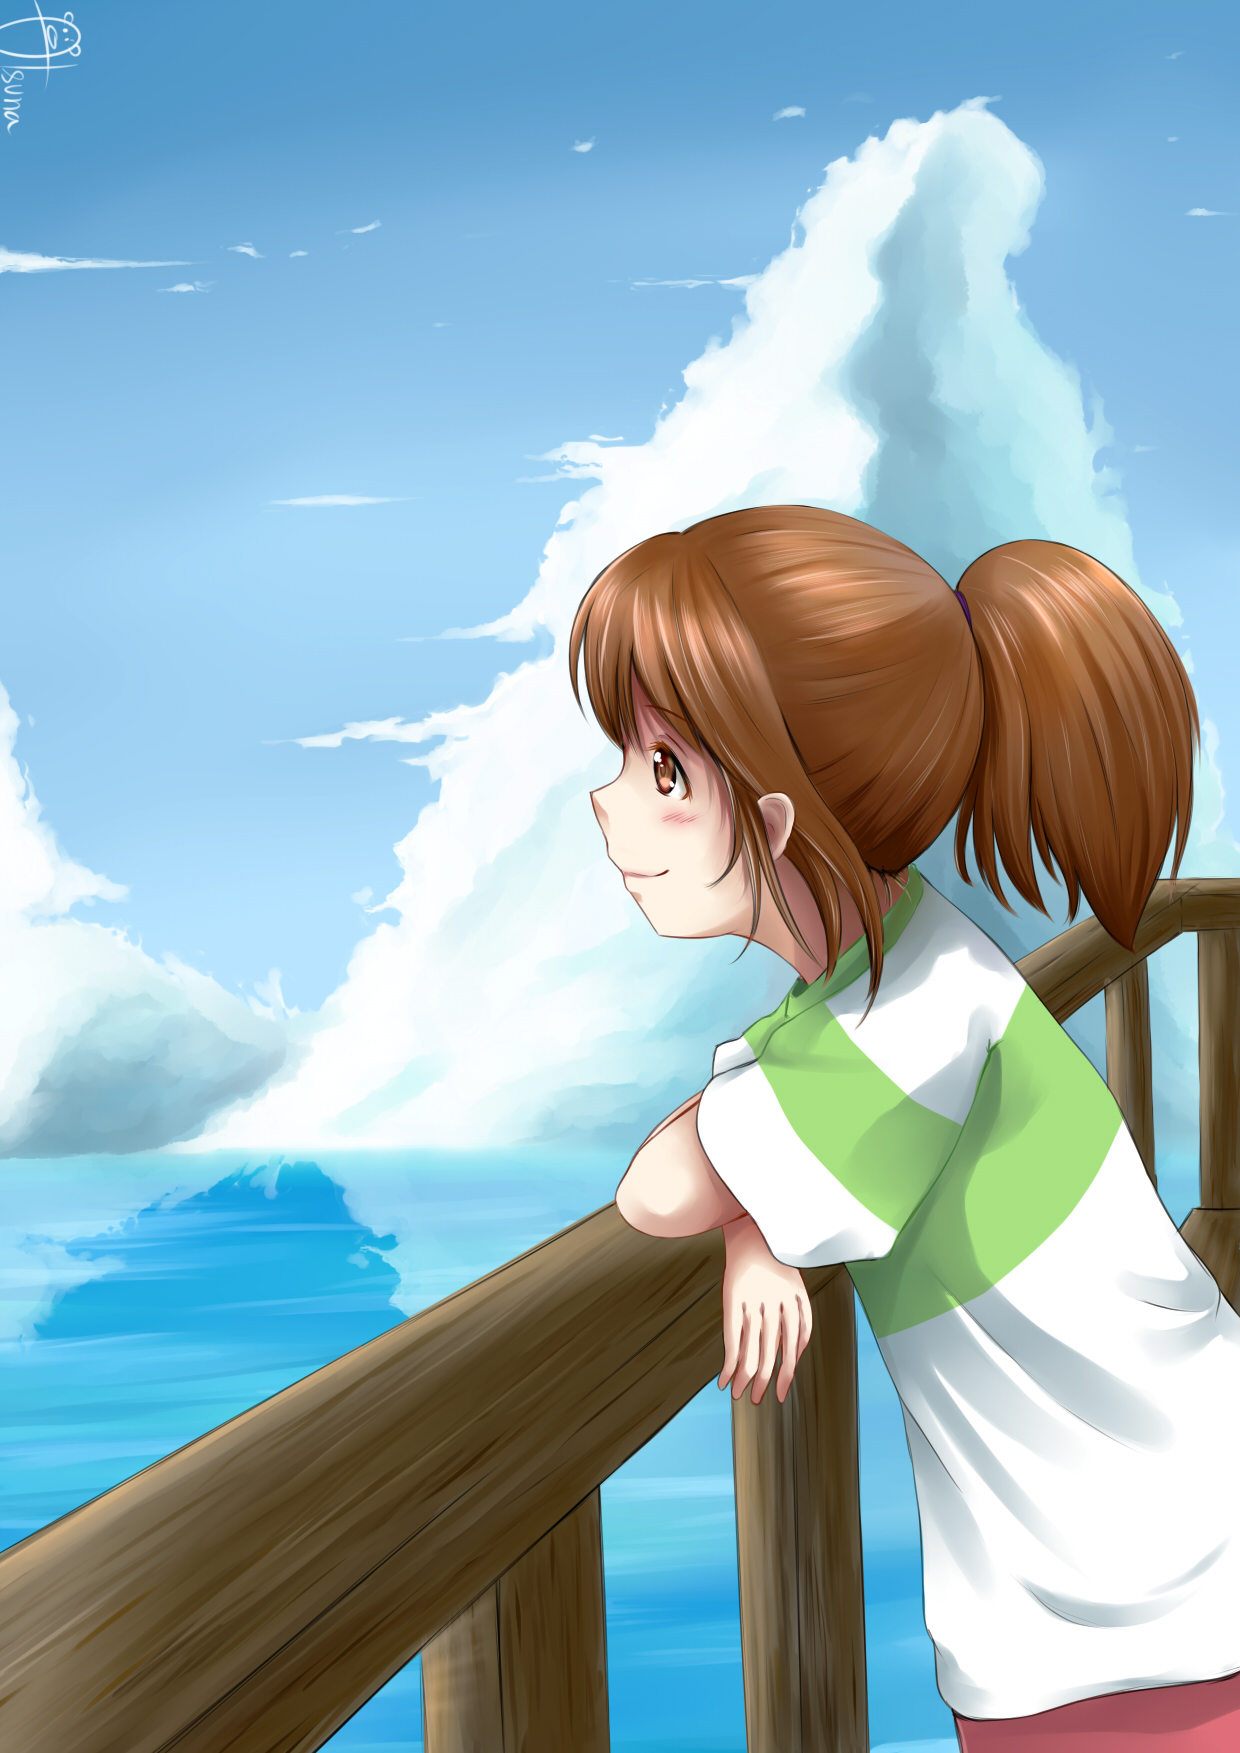 Fan art Spirited Away chihiro by Selvaria-B on DeviantArt